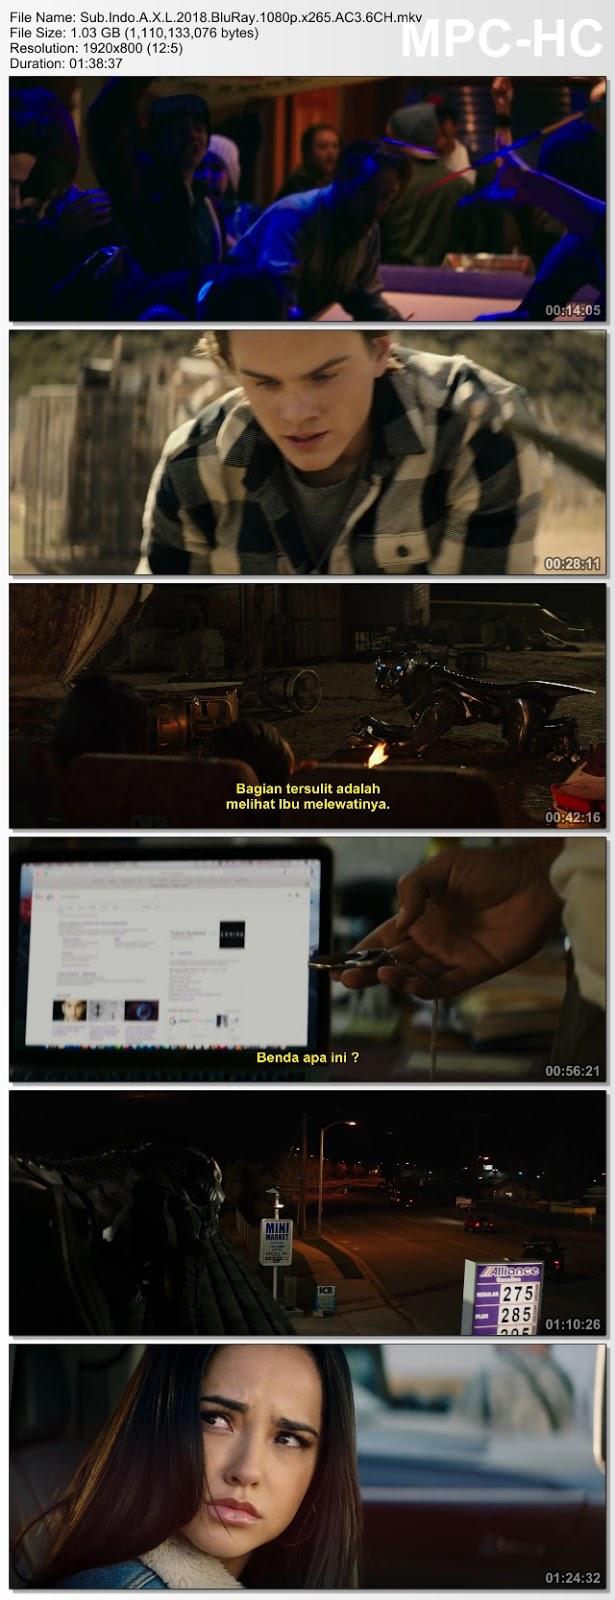 Screenshots Download Аксель (2018) BluRay 480p & 3GP Subtitle Indonesia